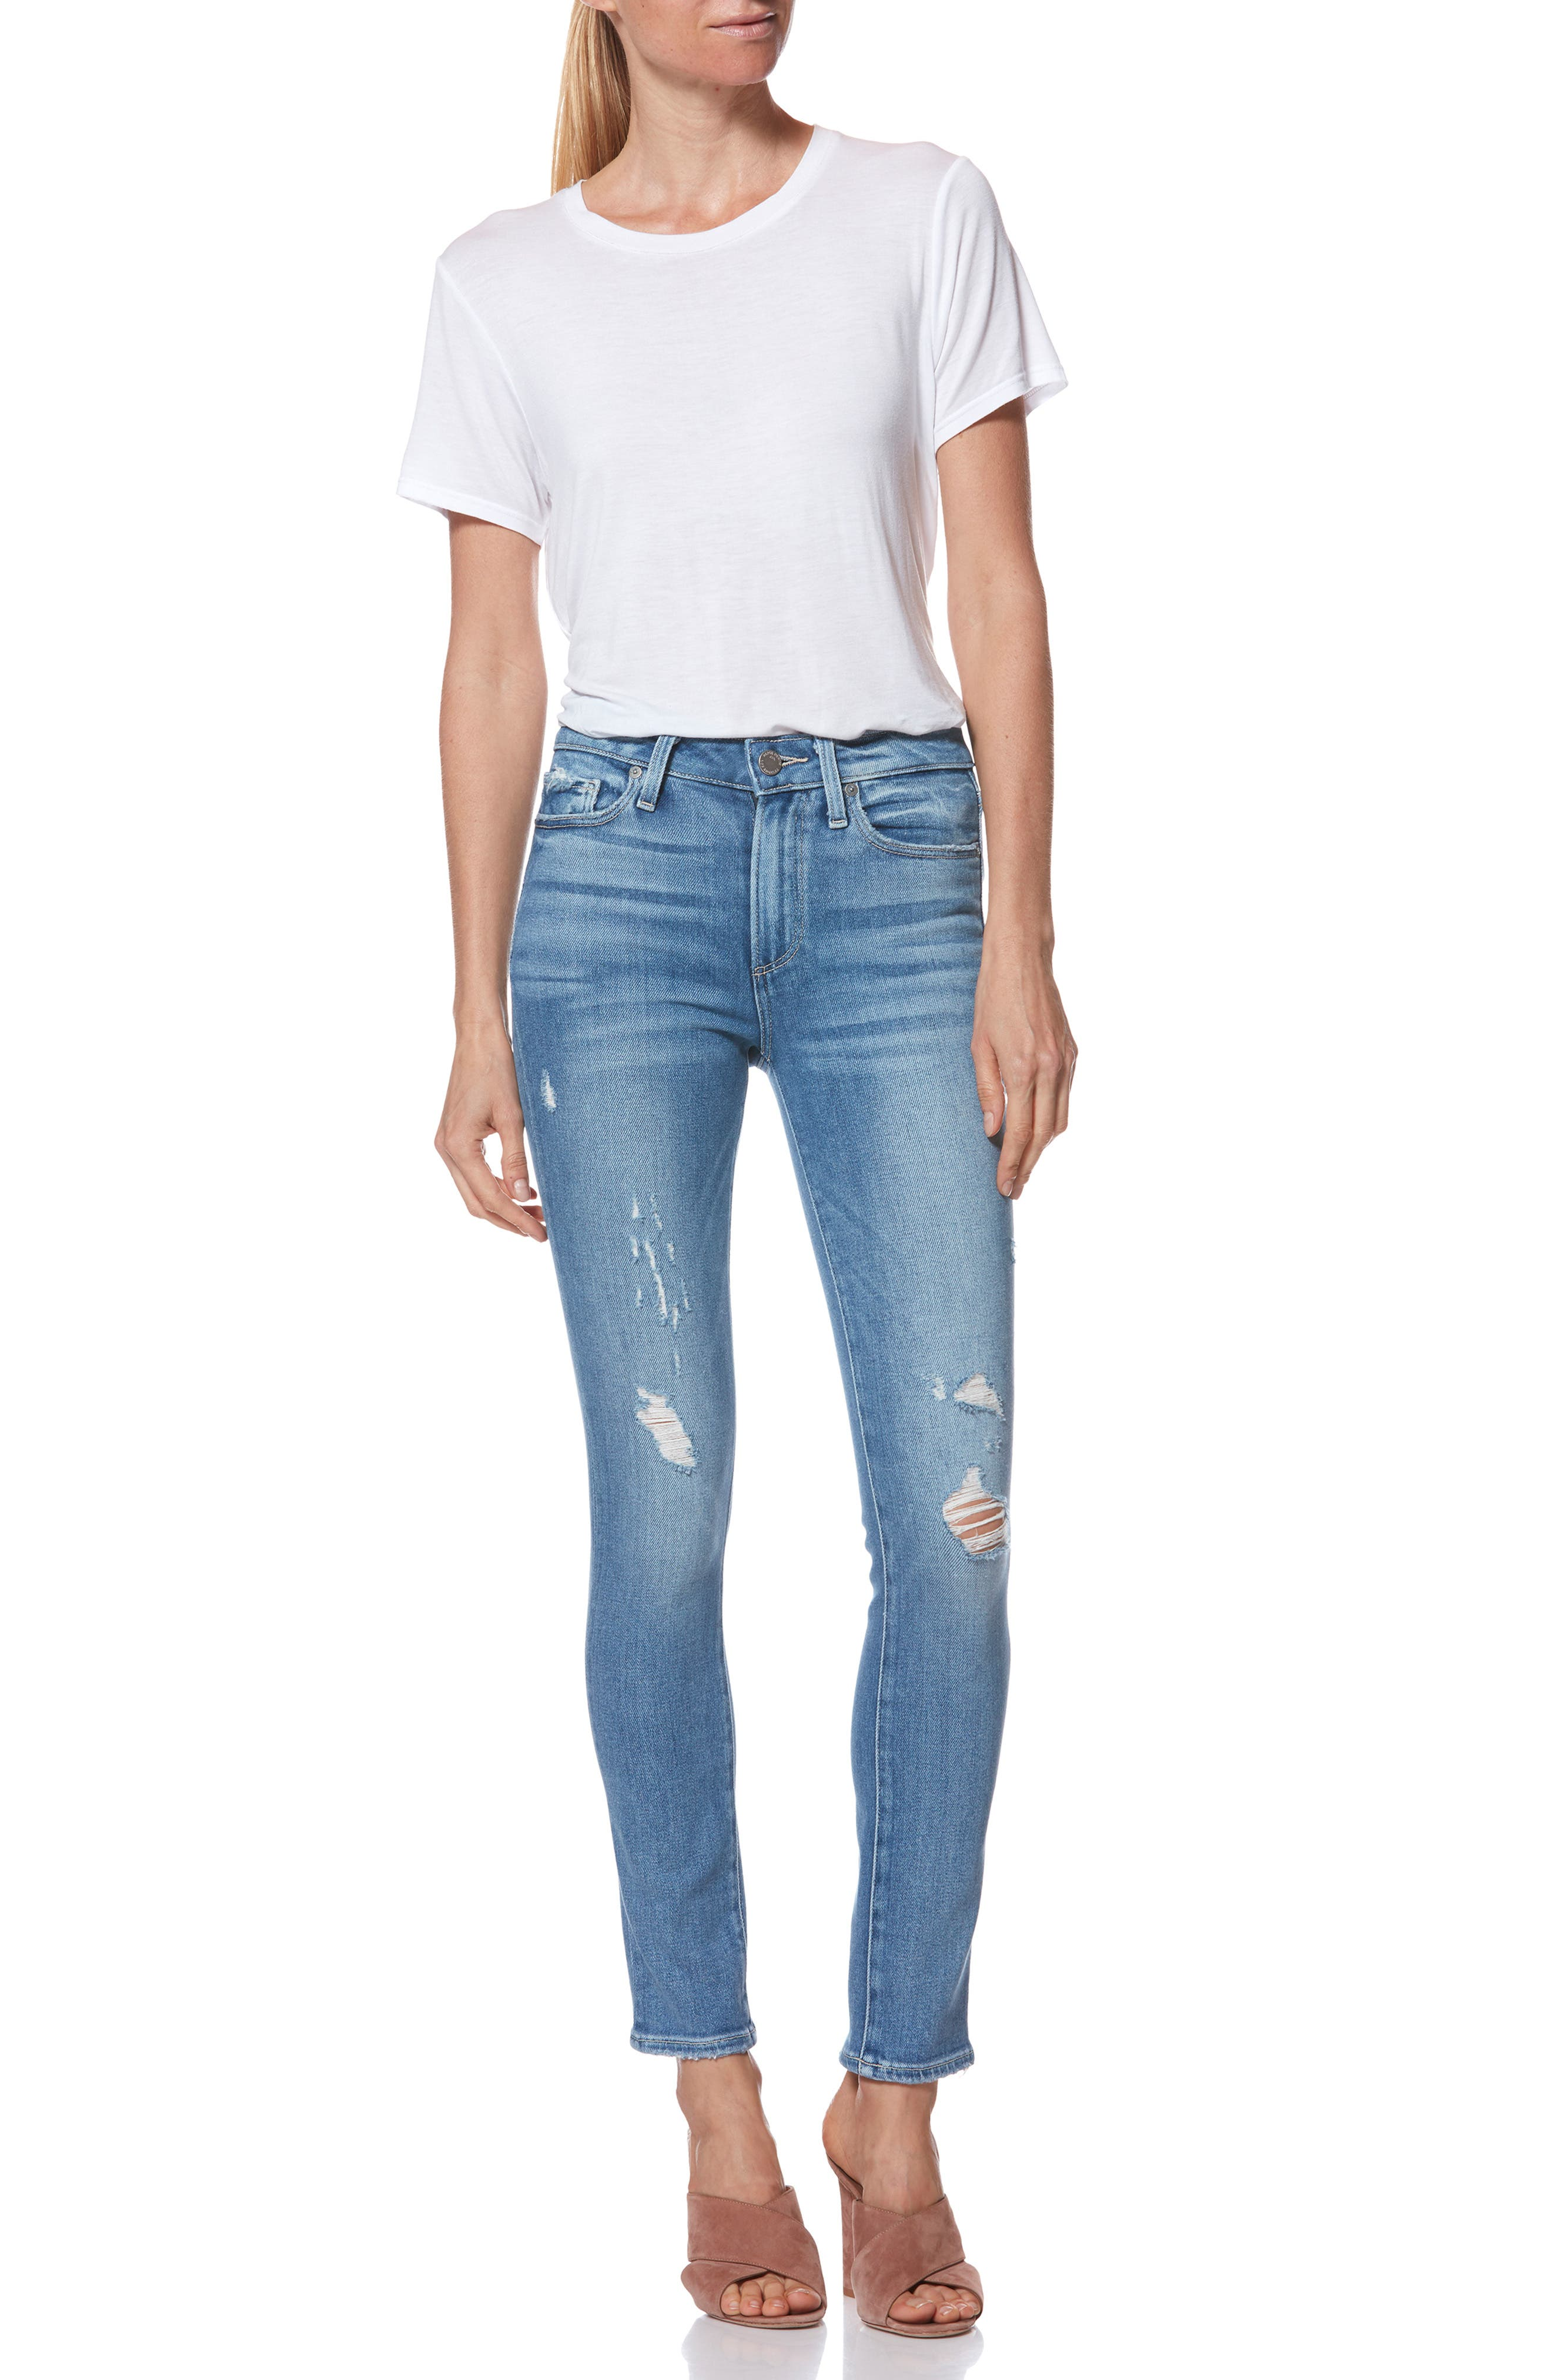 Hoxton High Waist Ankle Peg Jeans,                             Alternate thumbnail 8, color,                             KAYSON DISTRESSED